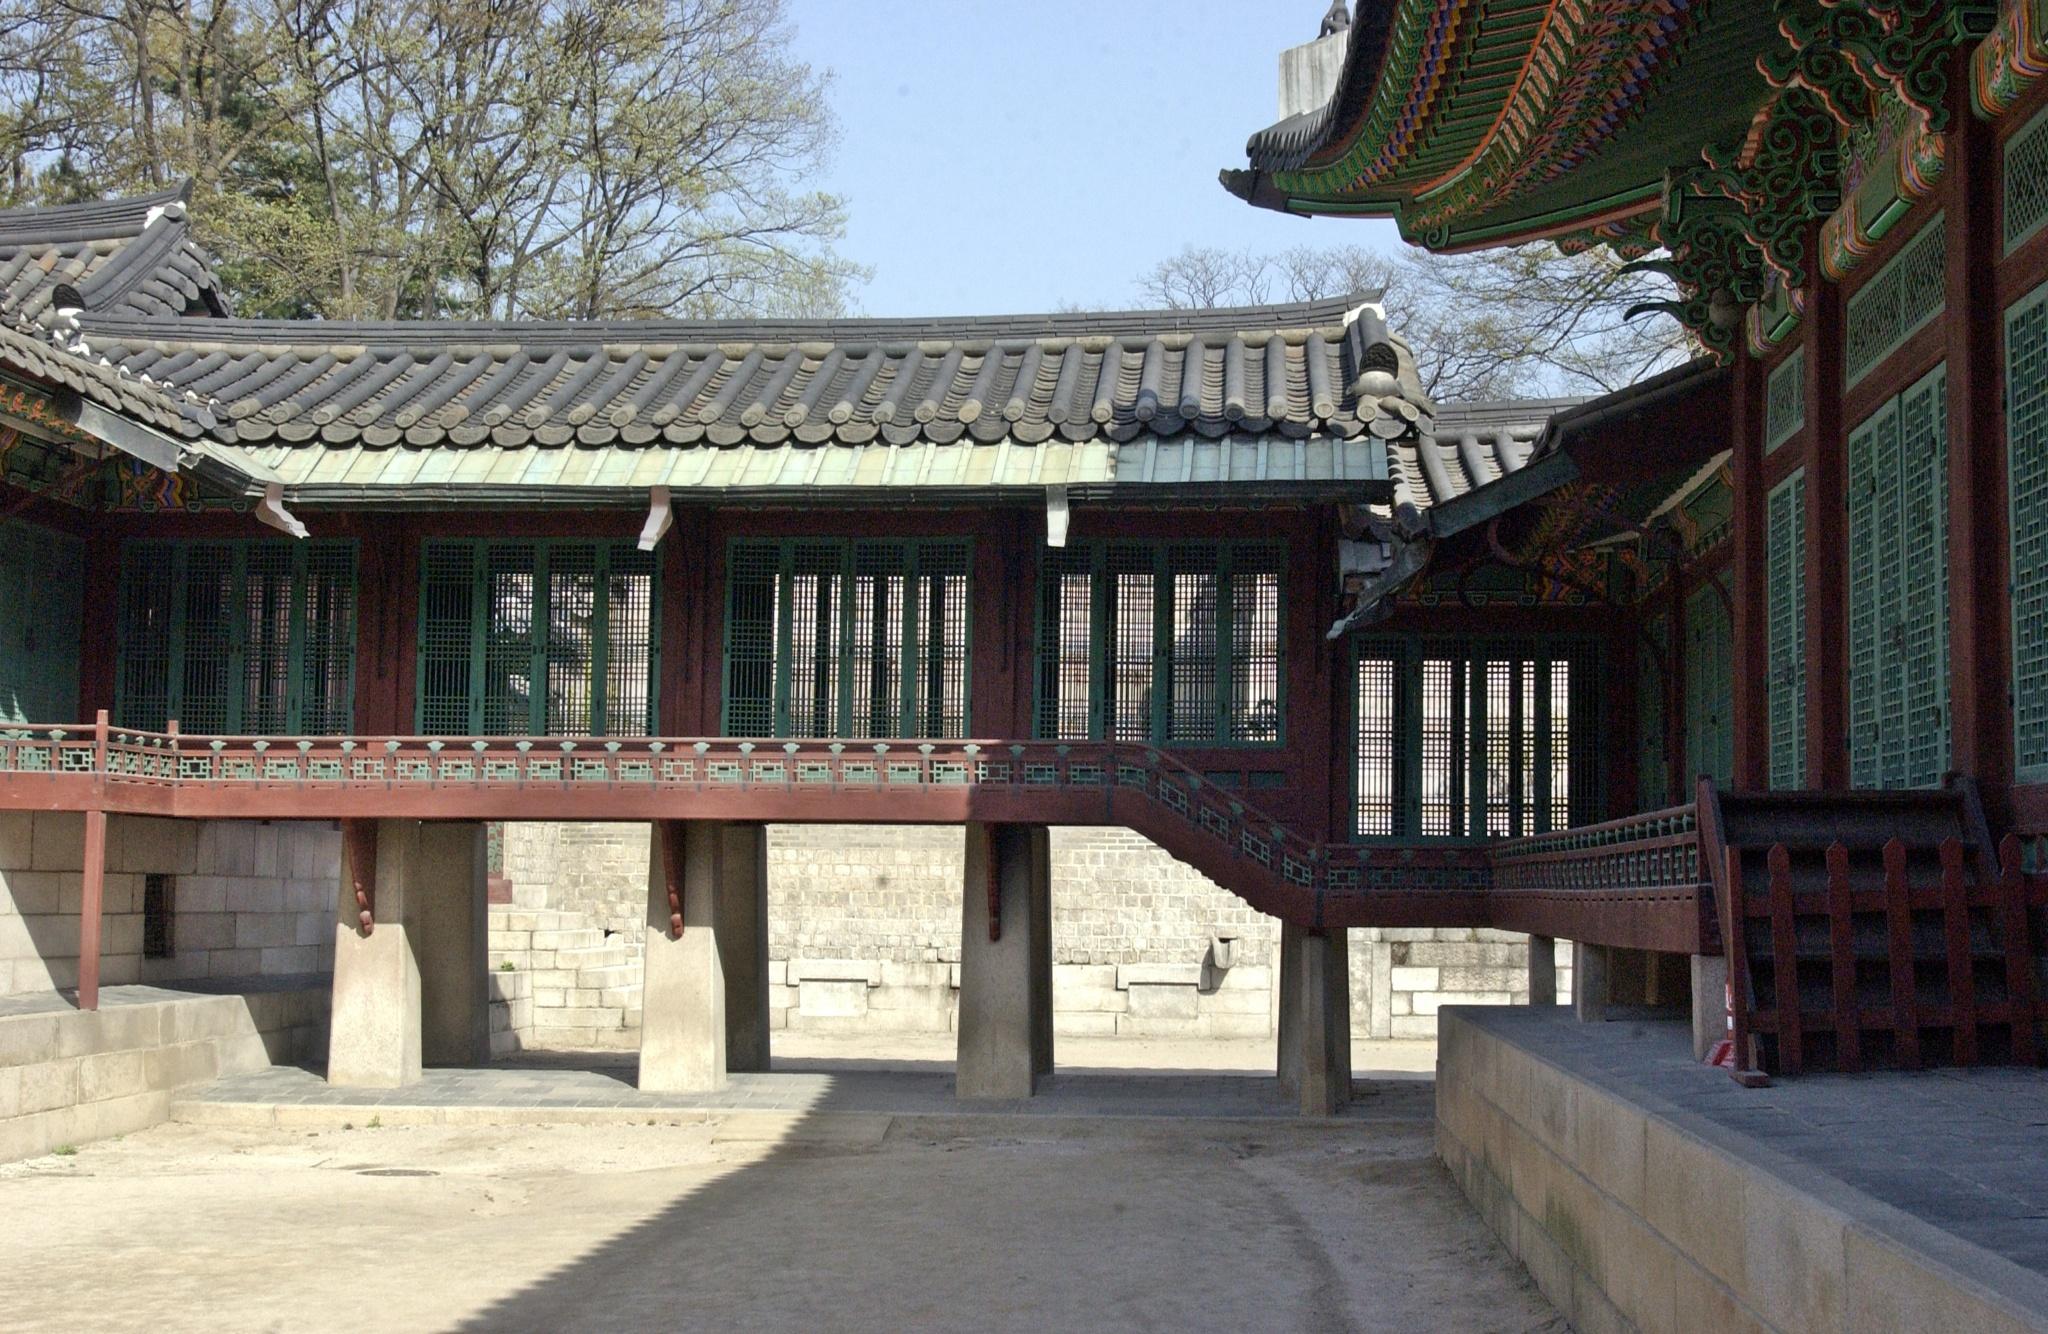 Palace Corridor, Seoul by arraguado